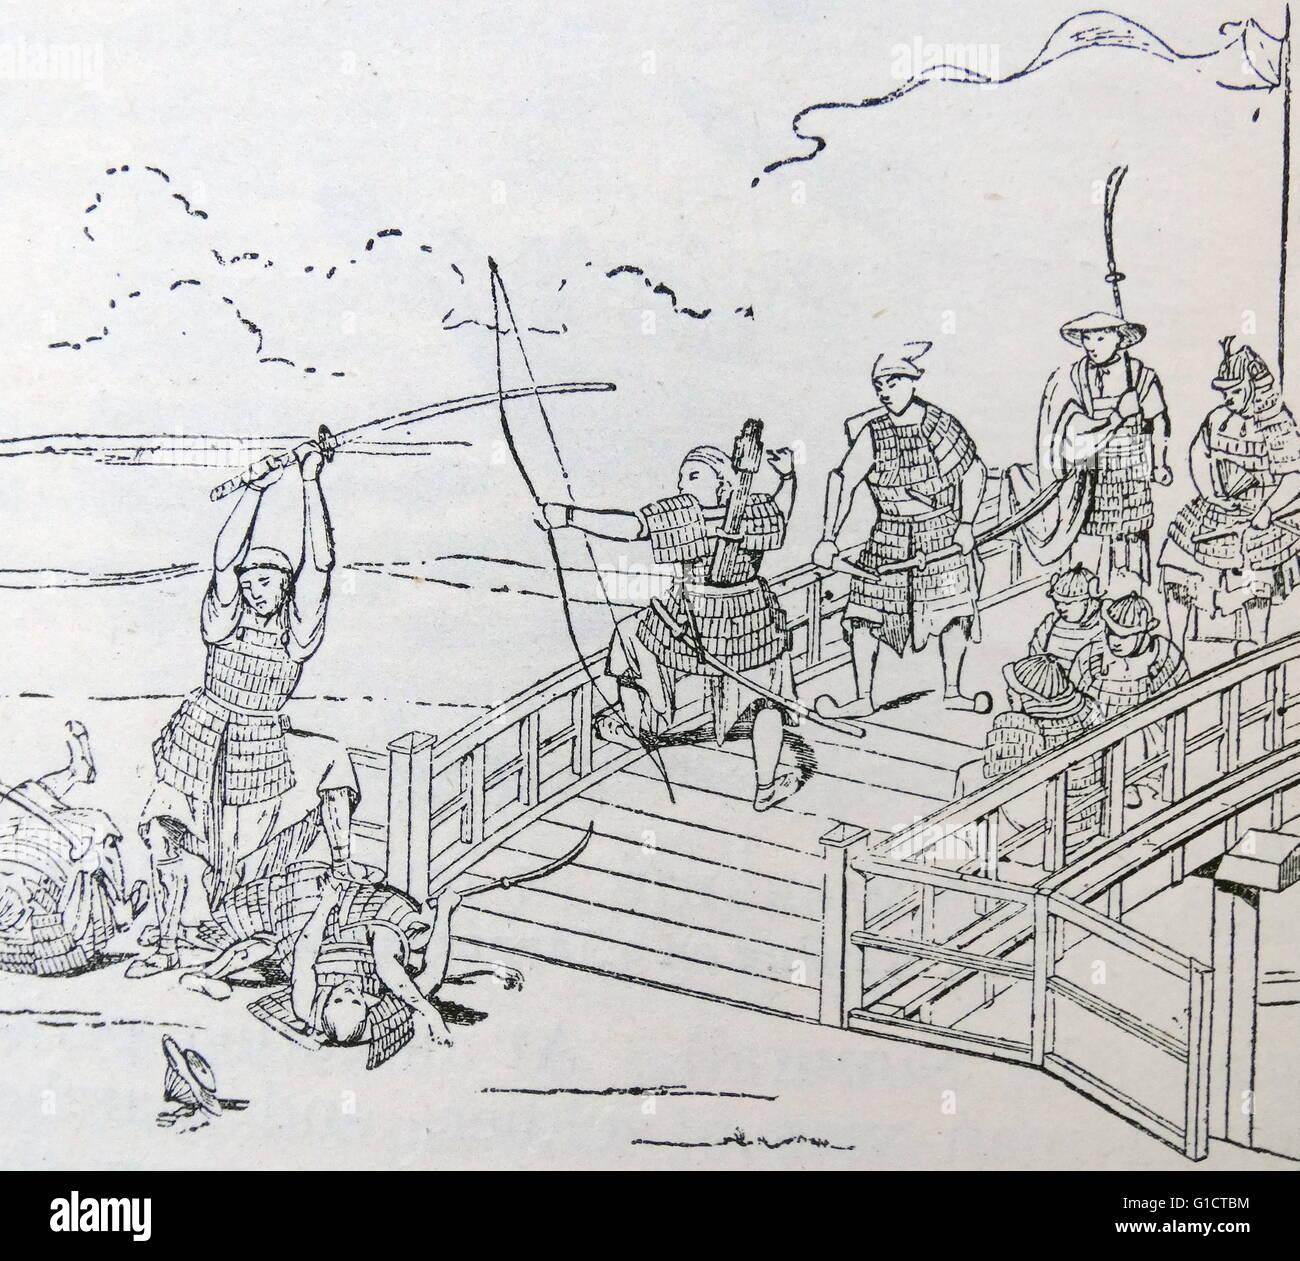 Woodcut depicting the massacre of the Mongols - Stock Image